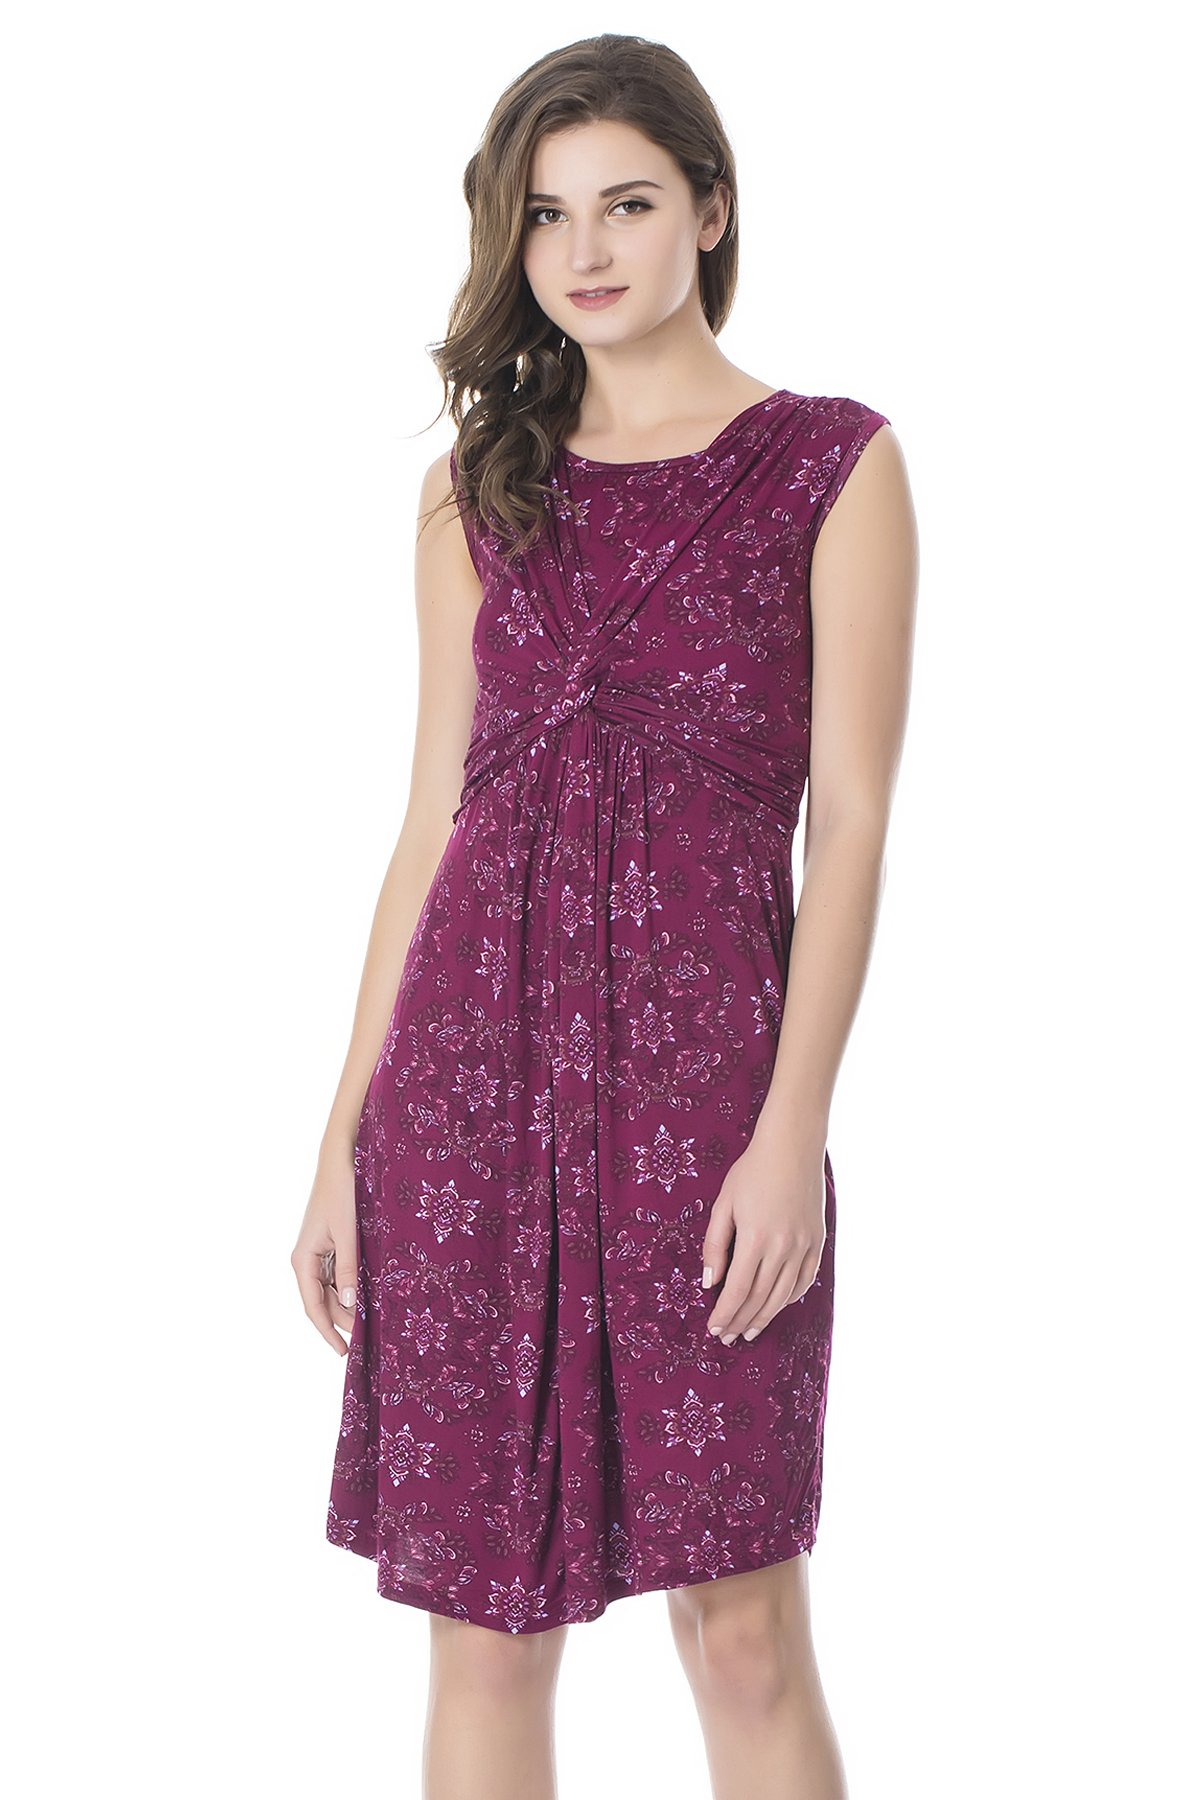 Bearsland Womens Maternity and Nursing Short Sleeves Summer Dress Purple/Red X-Large